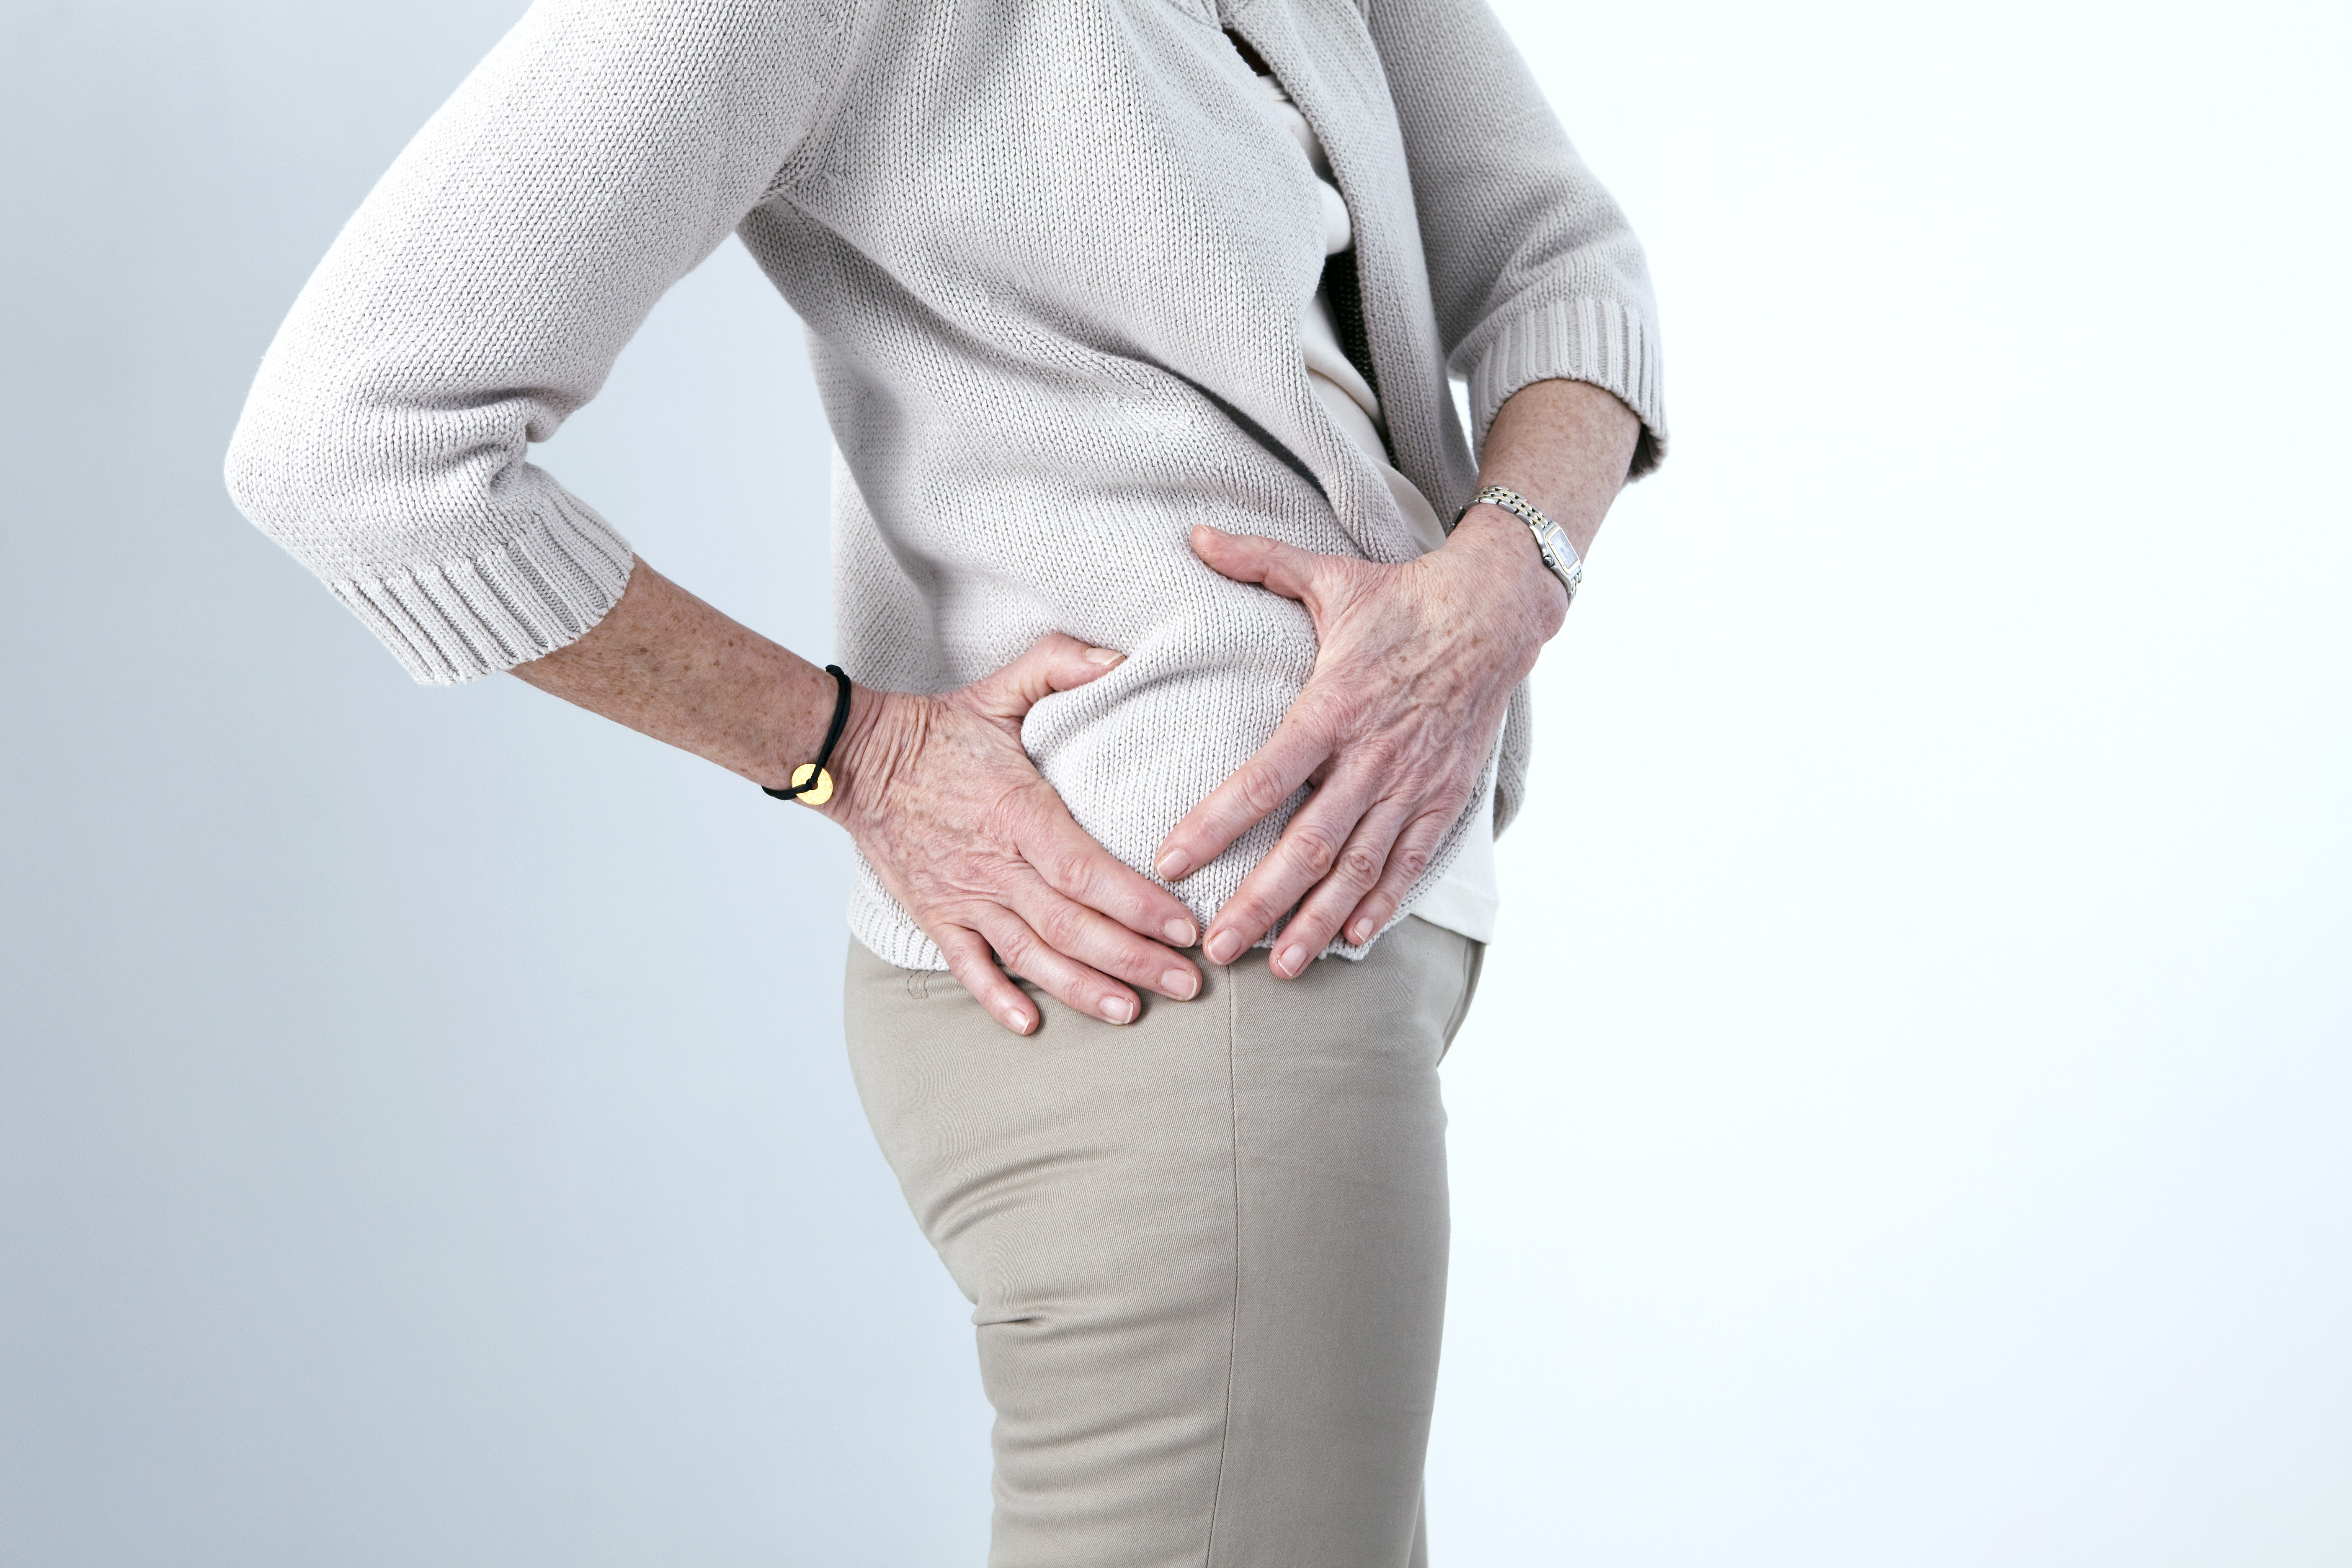 Hüftschmerzen - Fehlstellung des Hüftgelenks